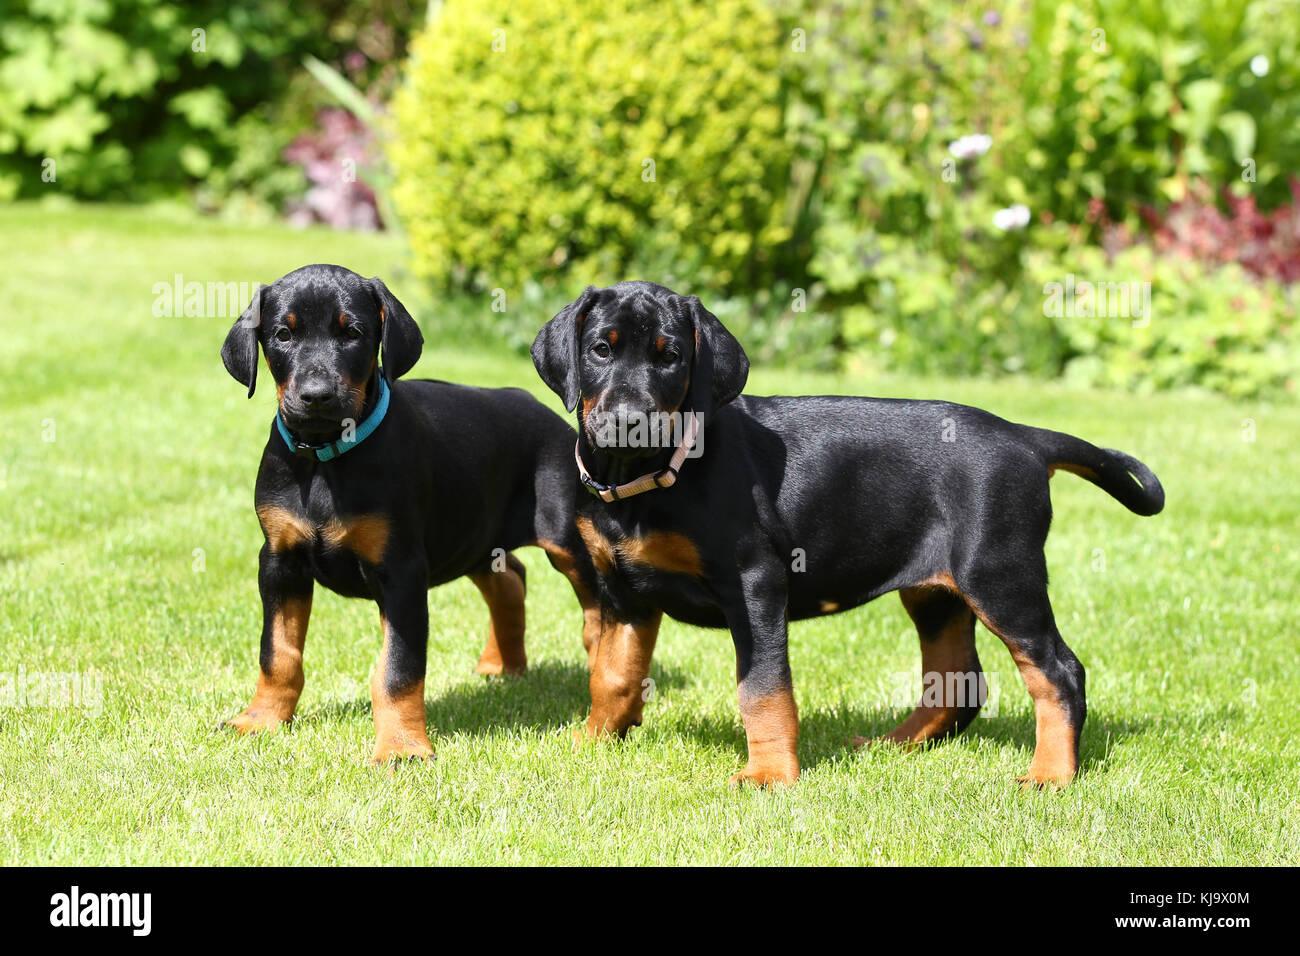 Doberman Pinscher Puppies - Stock Image